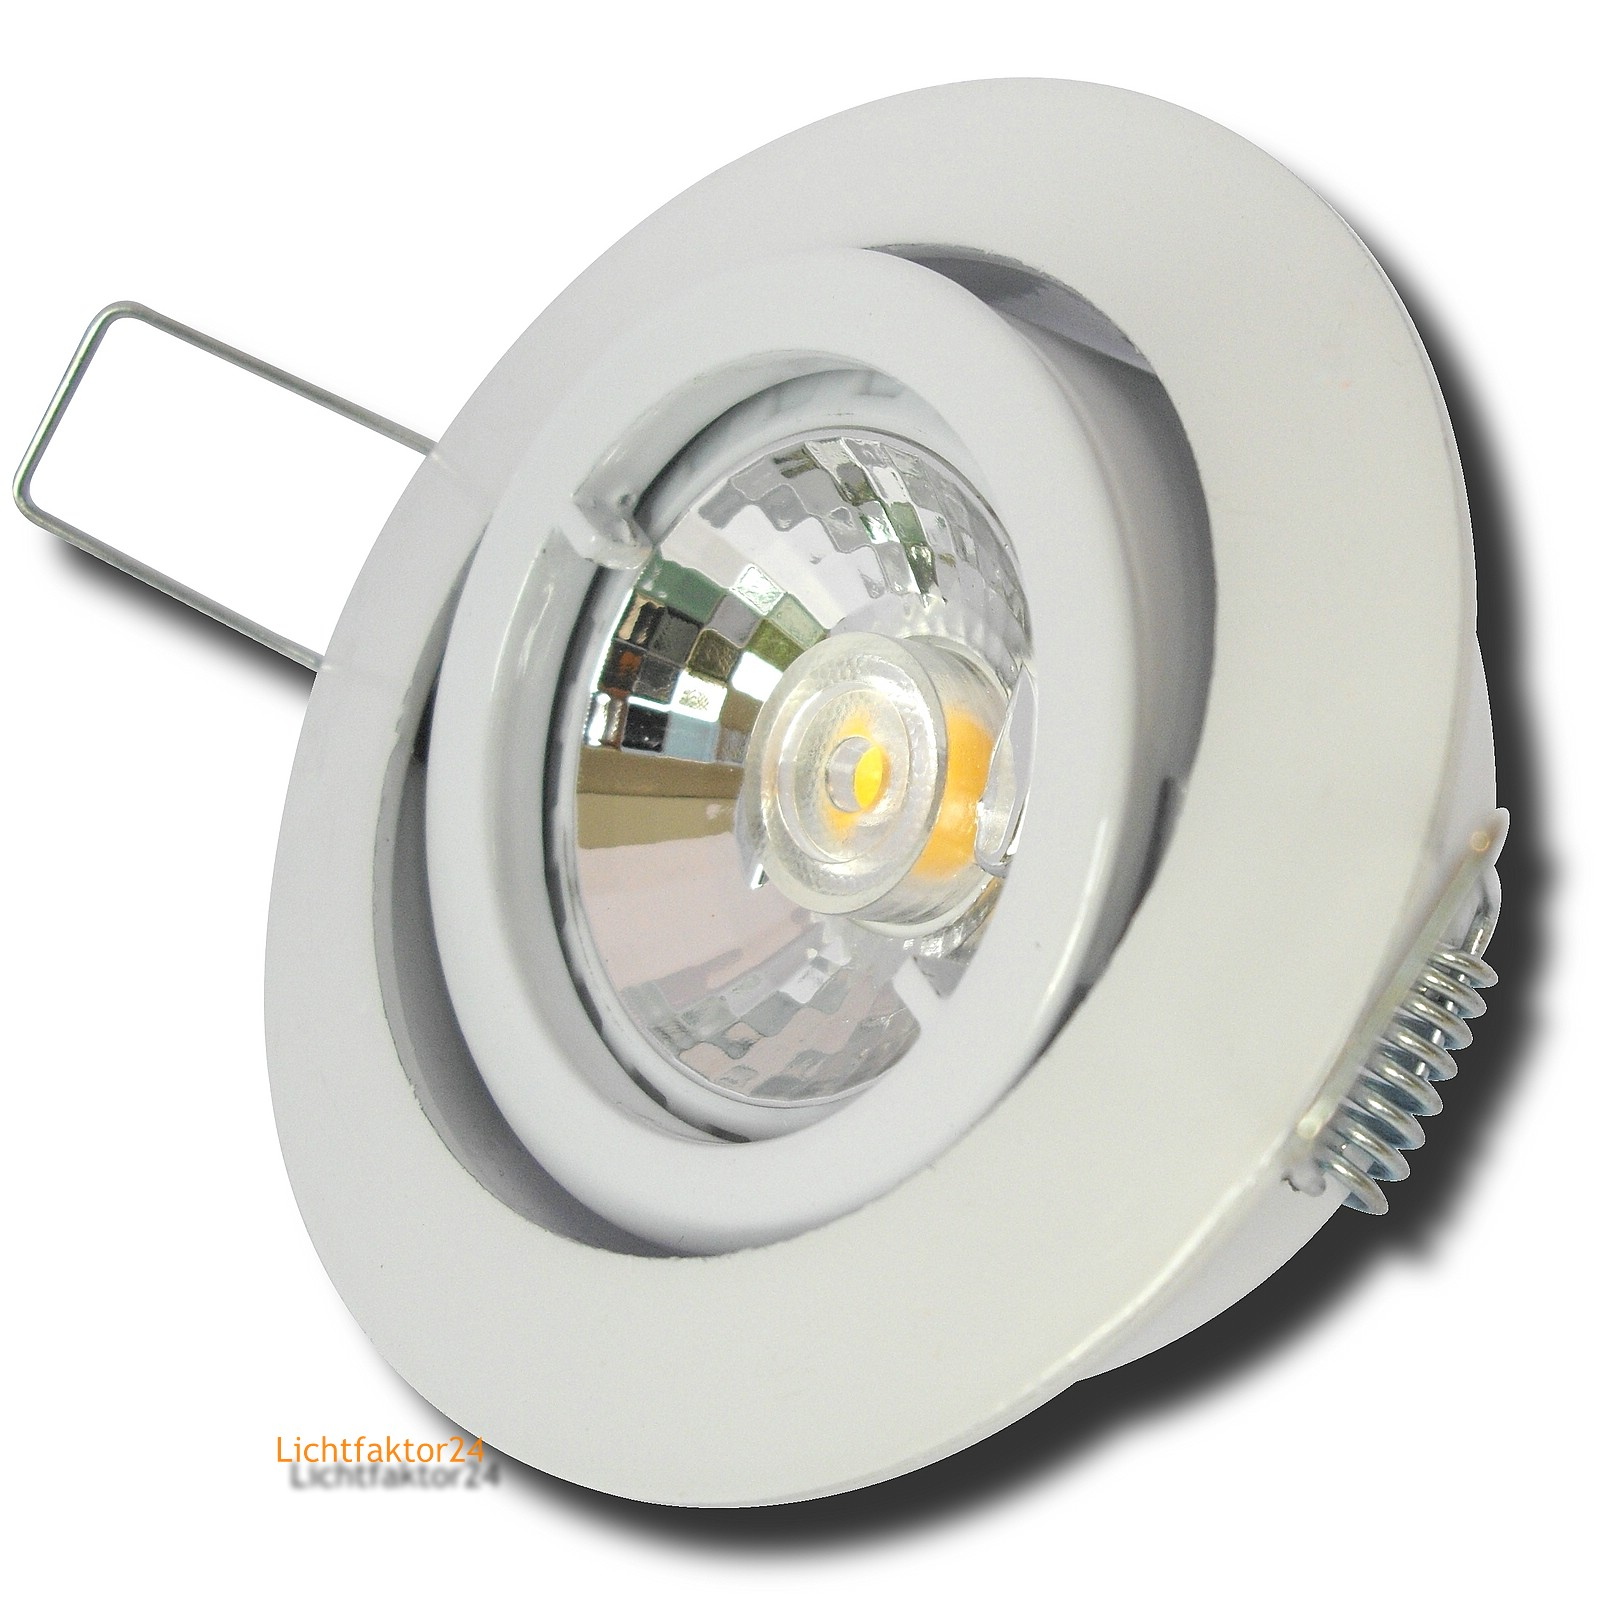 8er set 7w led einbaustrahler timo 230v dimmbare reflektor cob power leds gu10 ebay. Black Bedroom Furniture Sets. Home Design Ideas